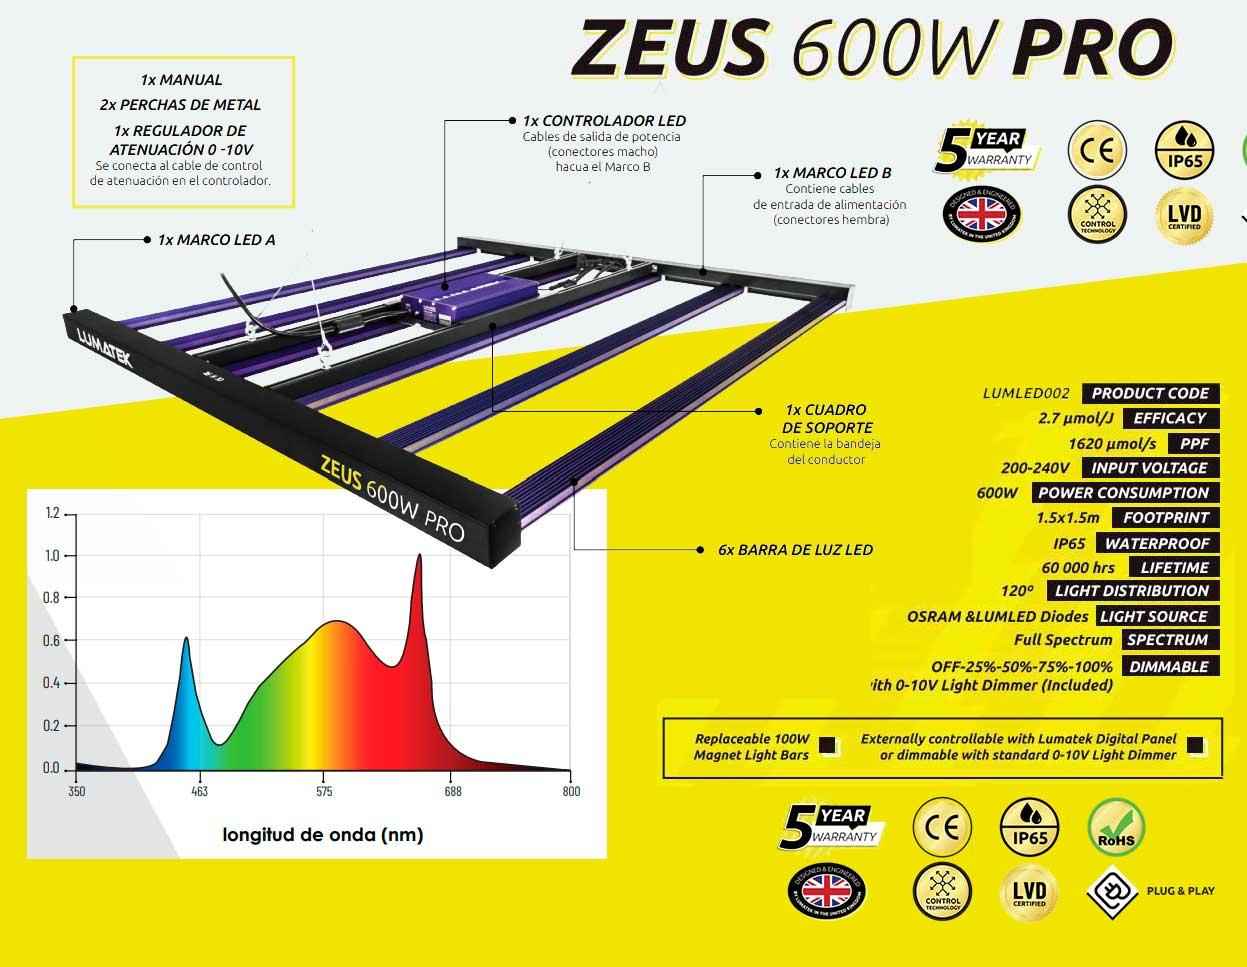 Zeus 600W Pro Led